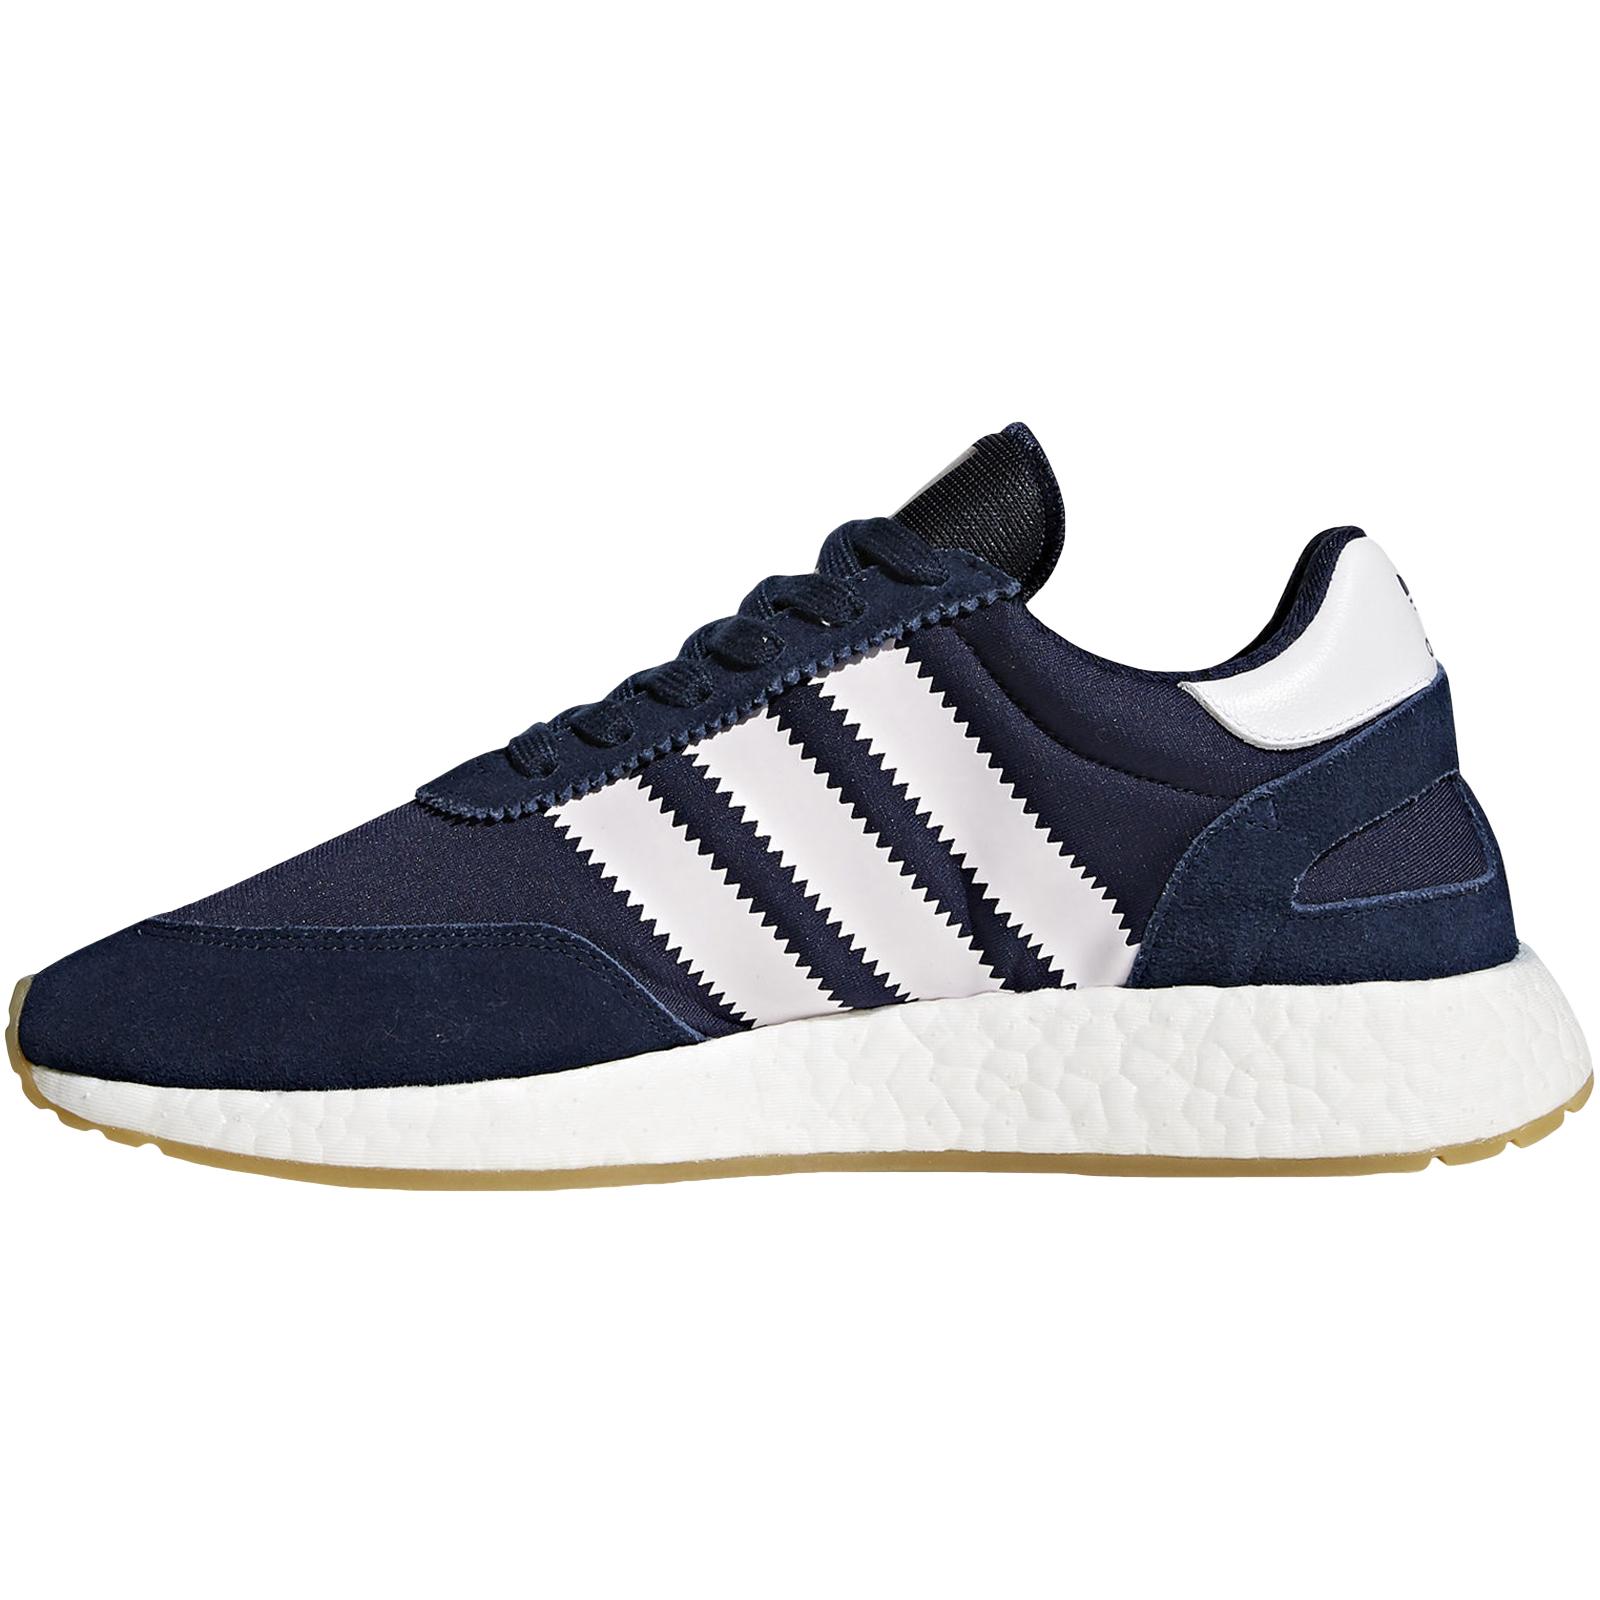 Detalles acerca de Adidas Originals Iniki Retro Correr Vintage Gamuza Training Shoes Trainers mostrar título original